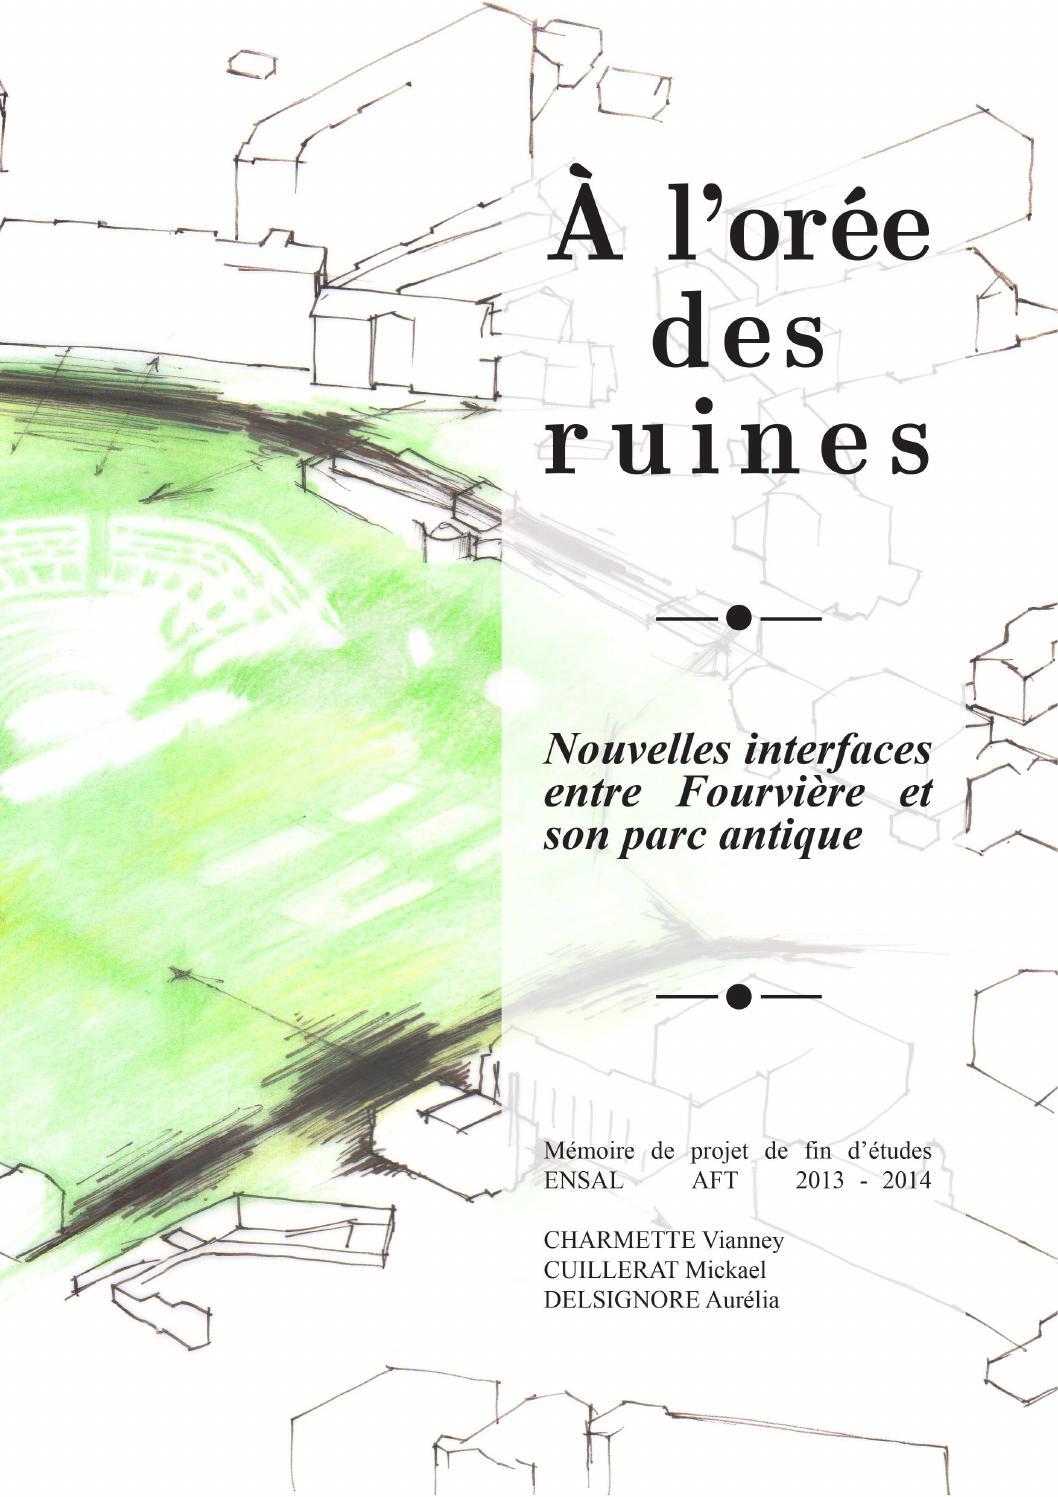 Rune usine frontière Guide de rencontre